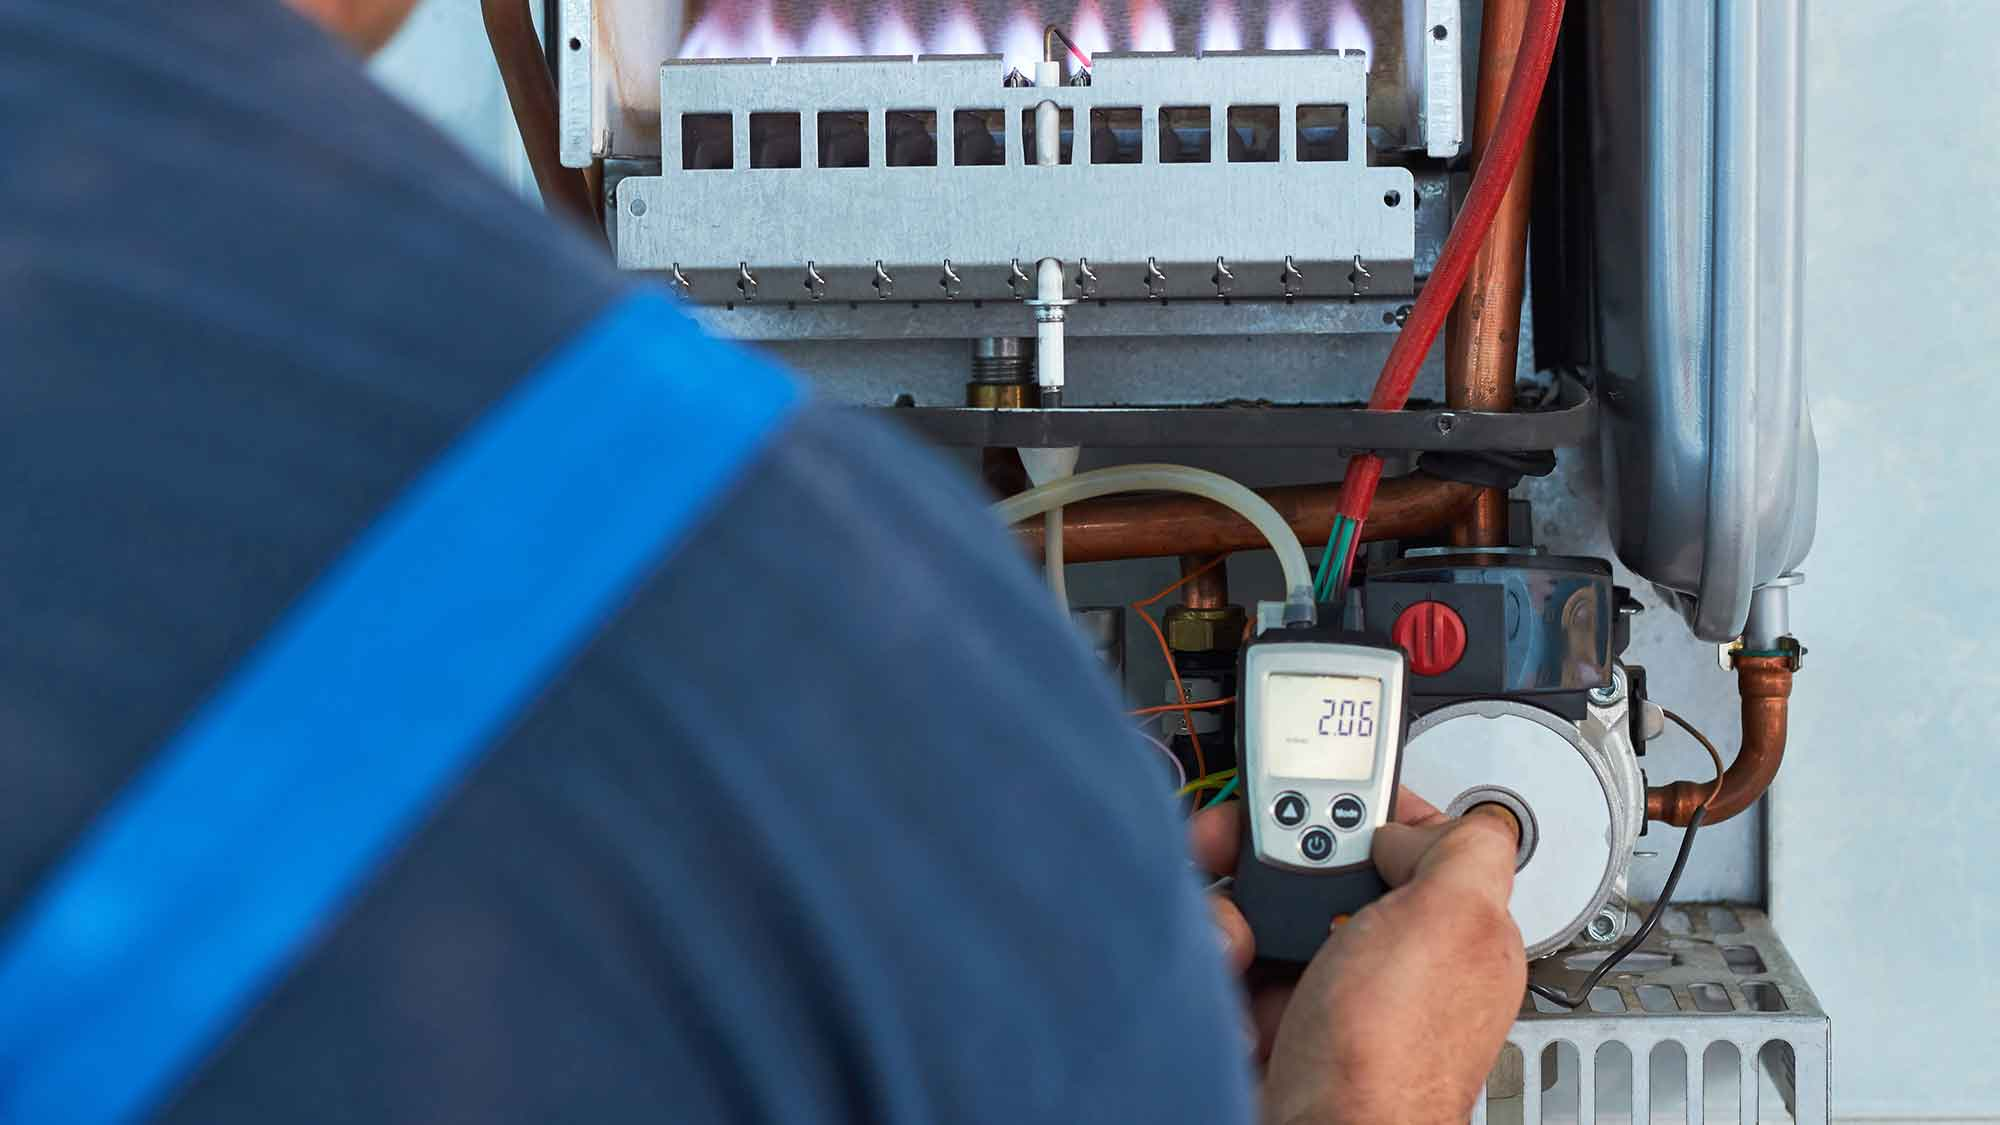 boiler servicing essex maintenance leigh on sea repair